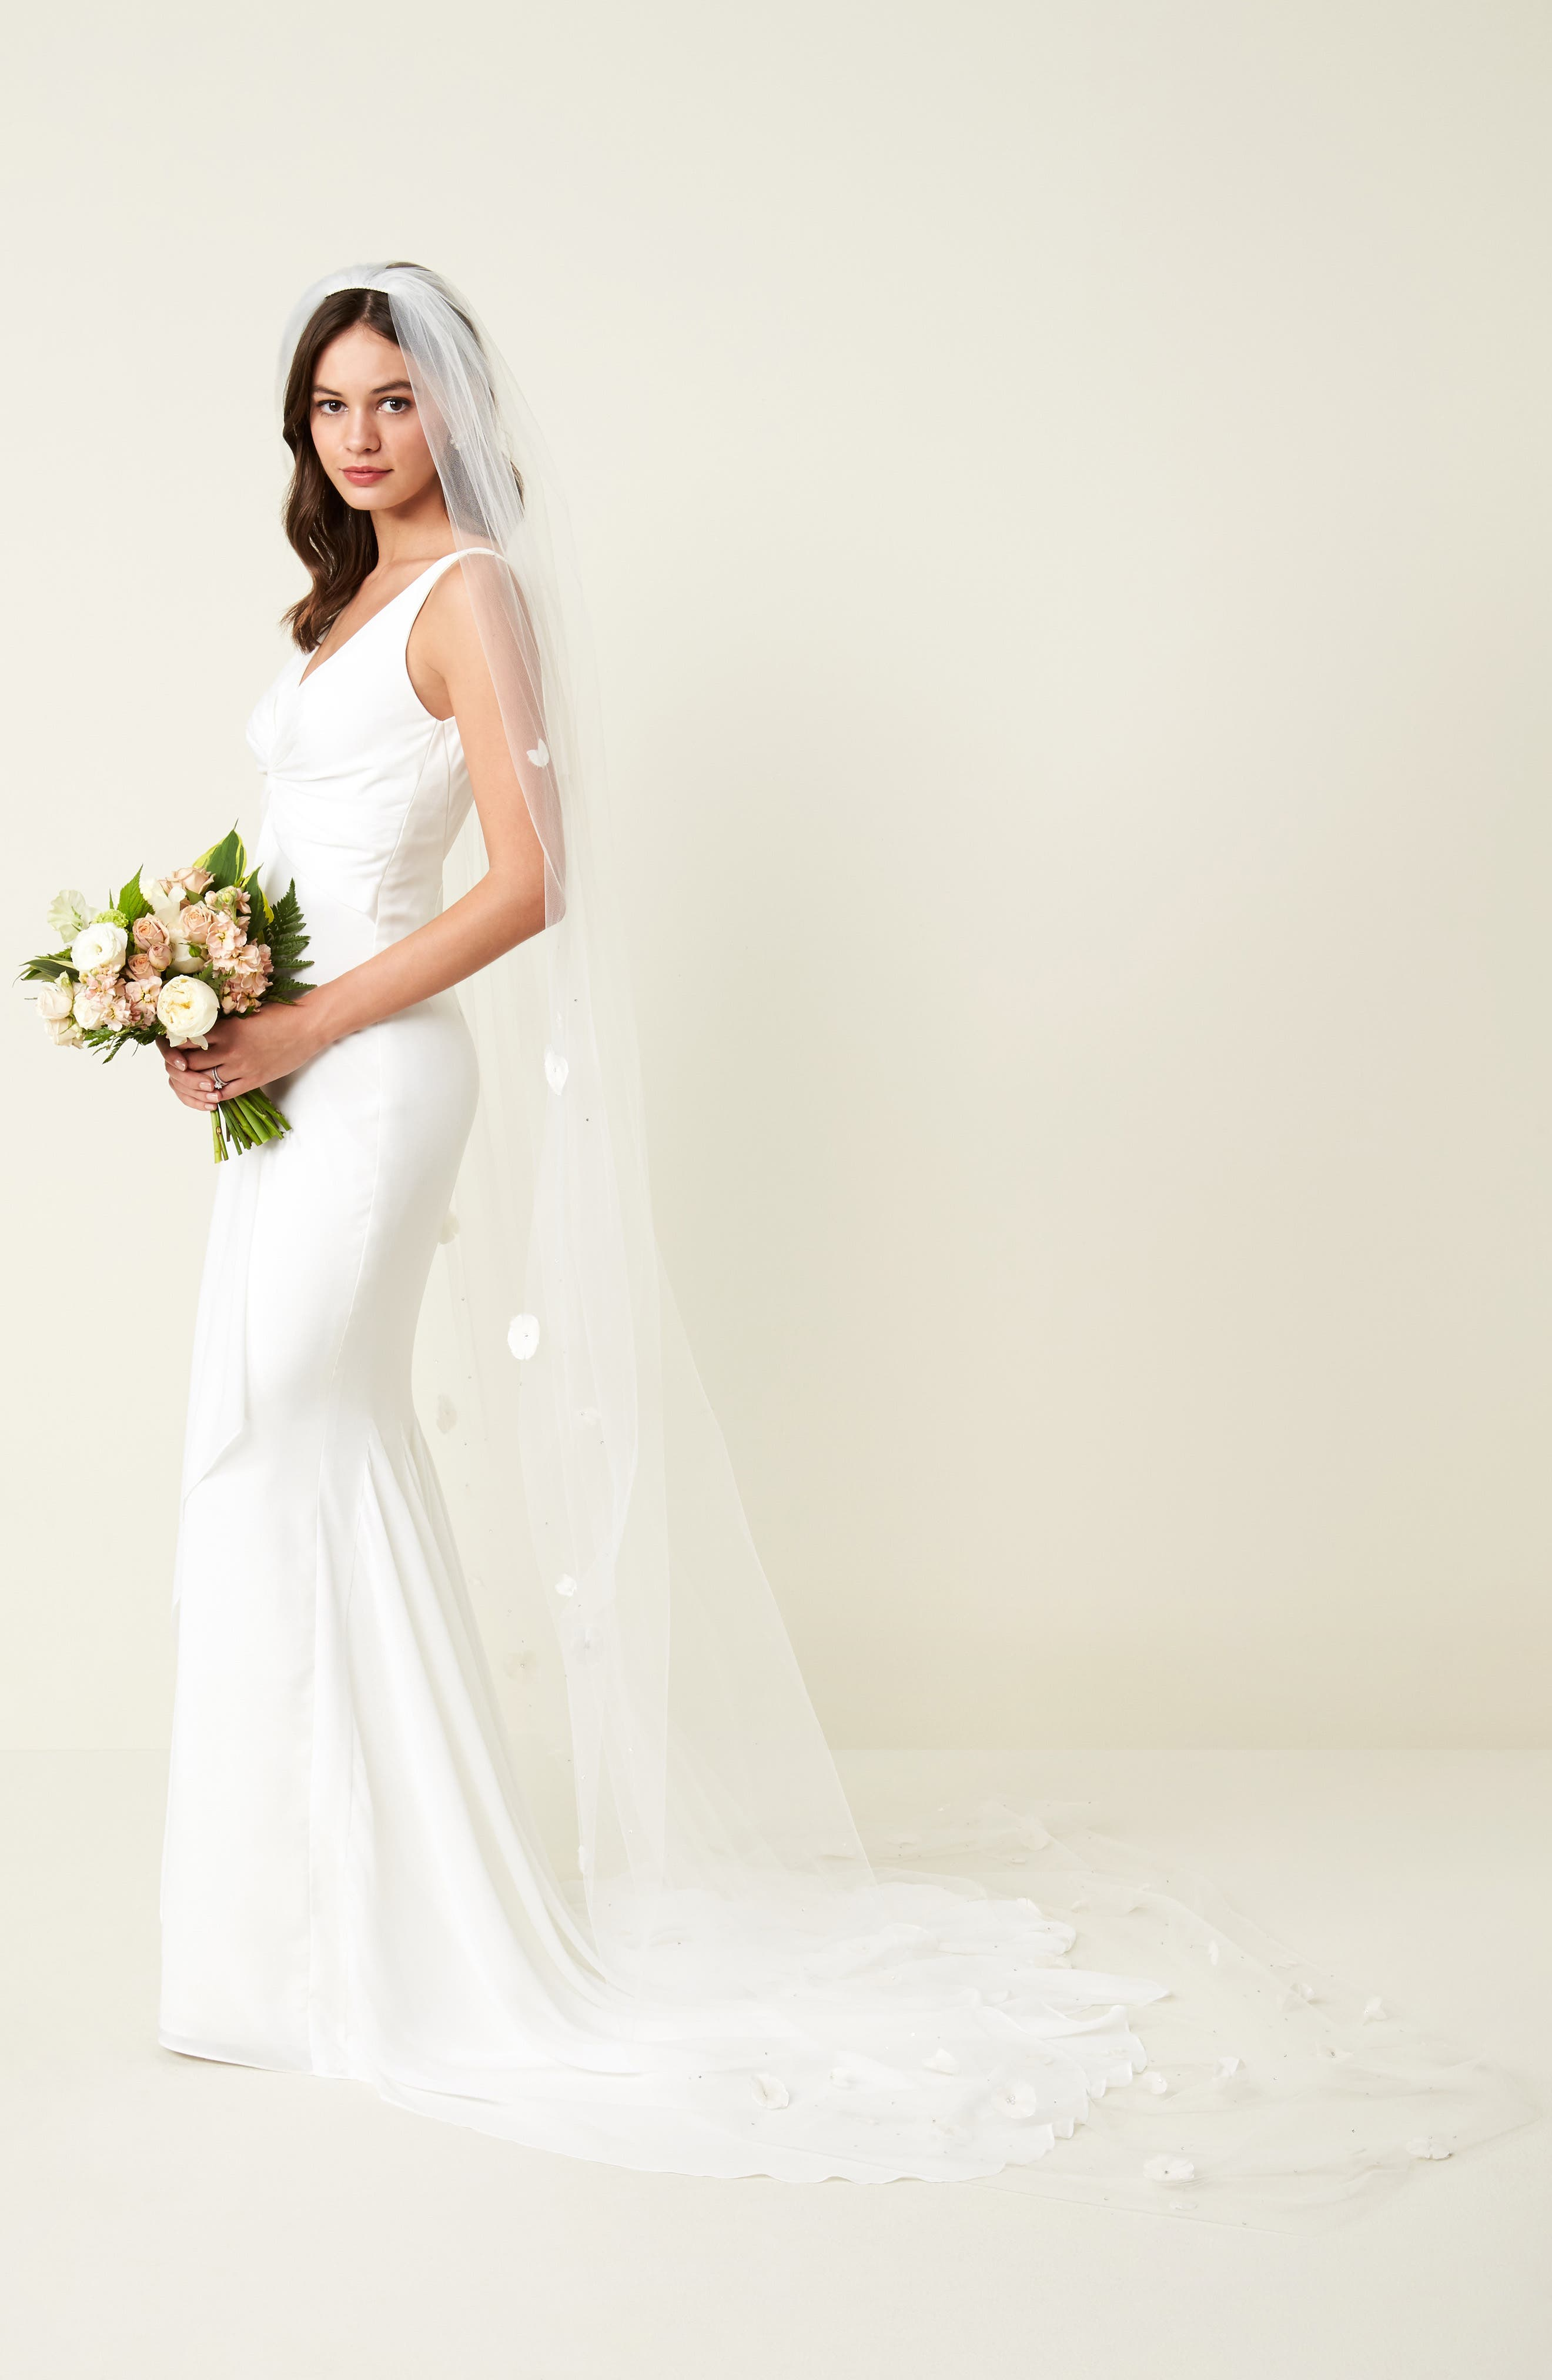 Fleet Embellished Bridal Veil,                             Alternate thumbnail 3, color,                             LIGHT IVORY